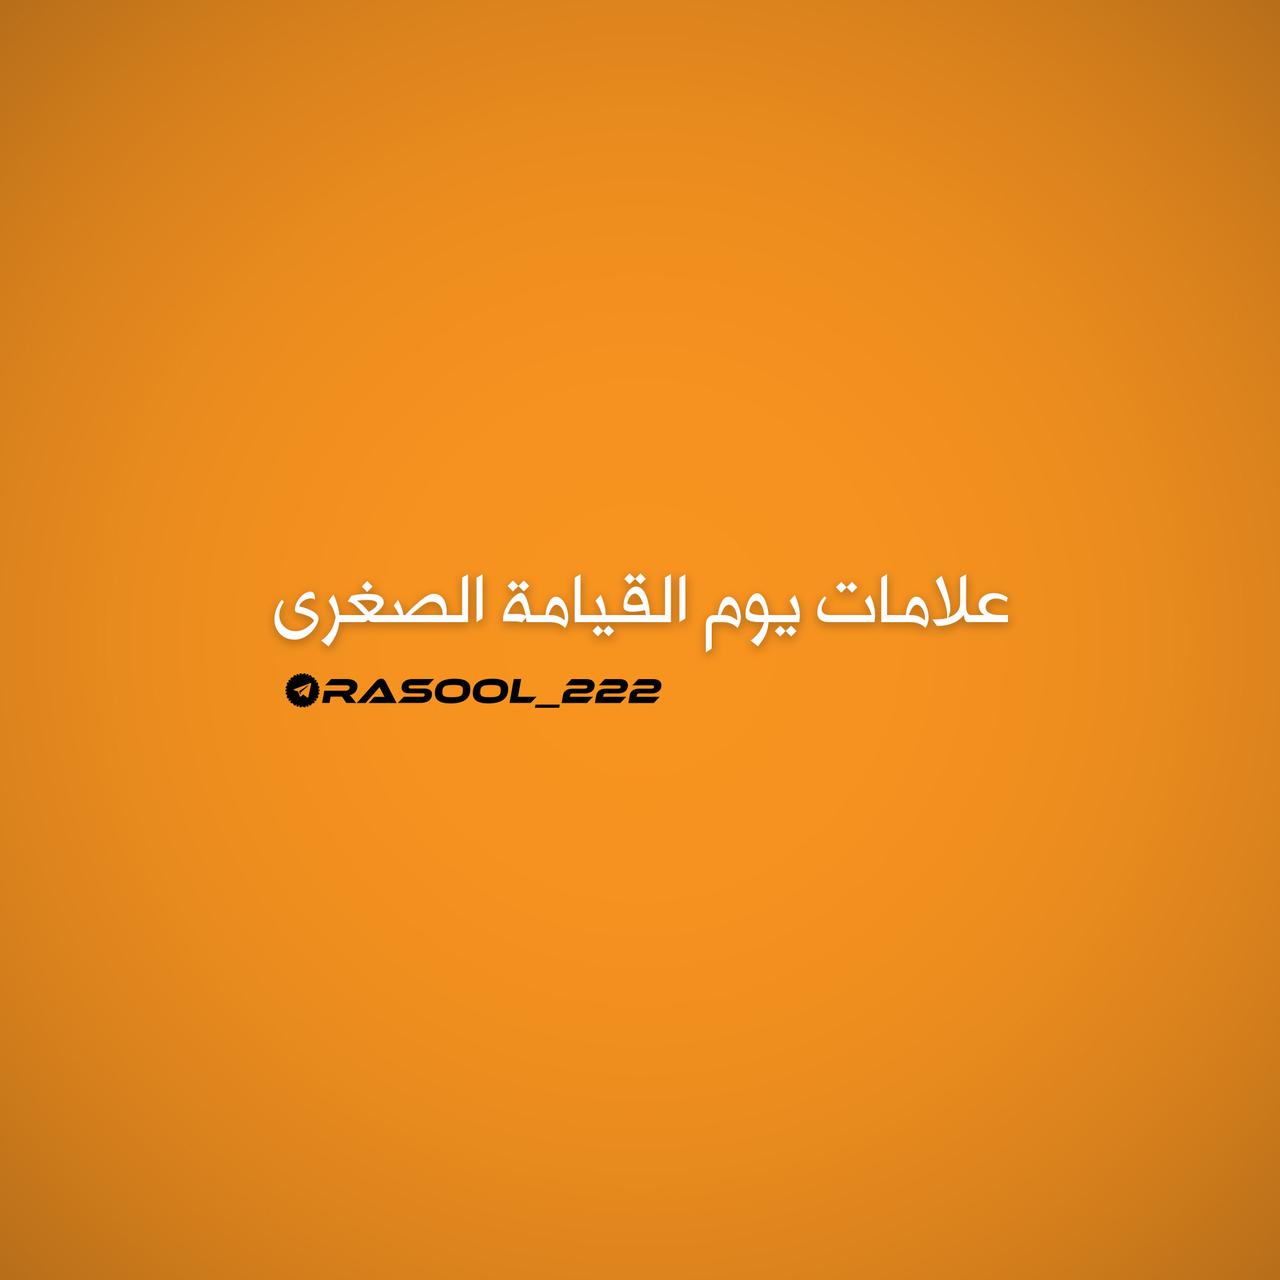 article, ﻭﻃﻦ, and العراق  image